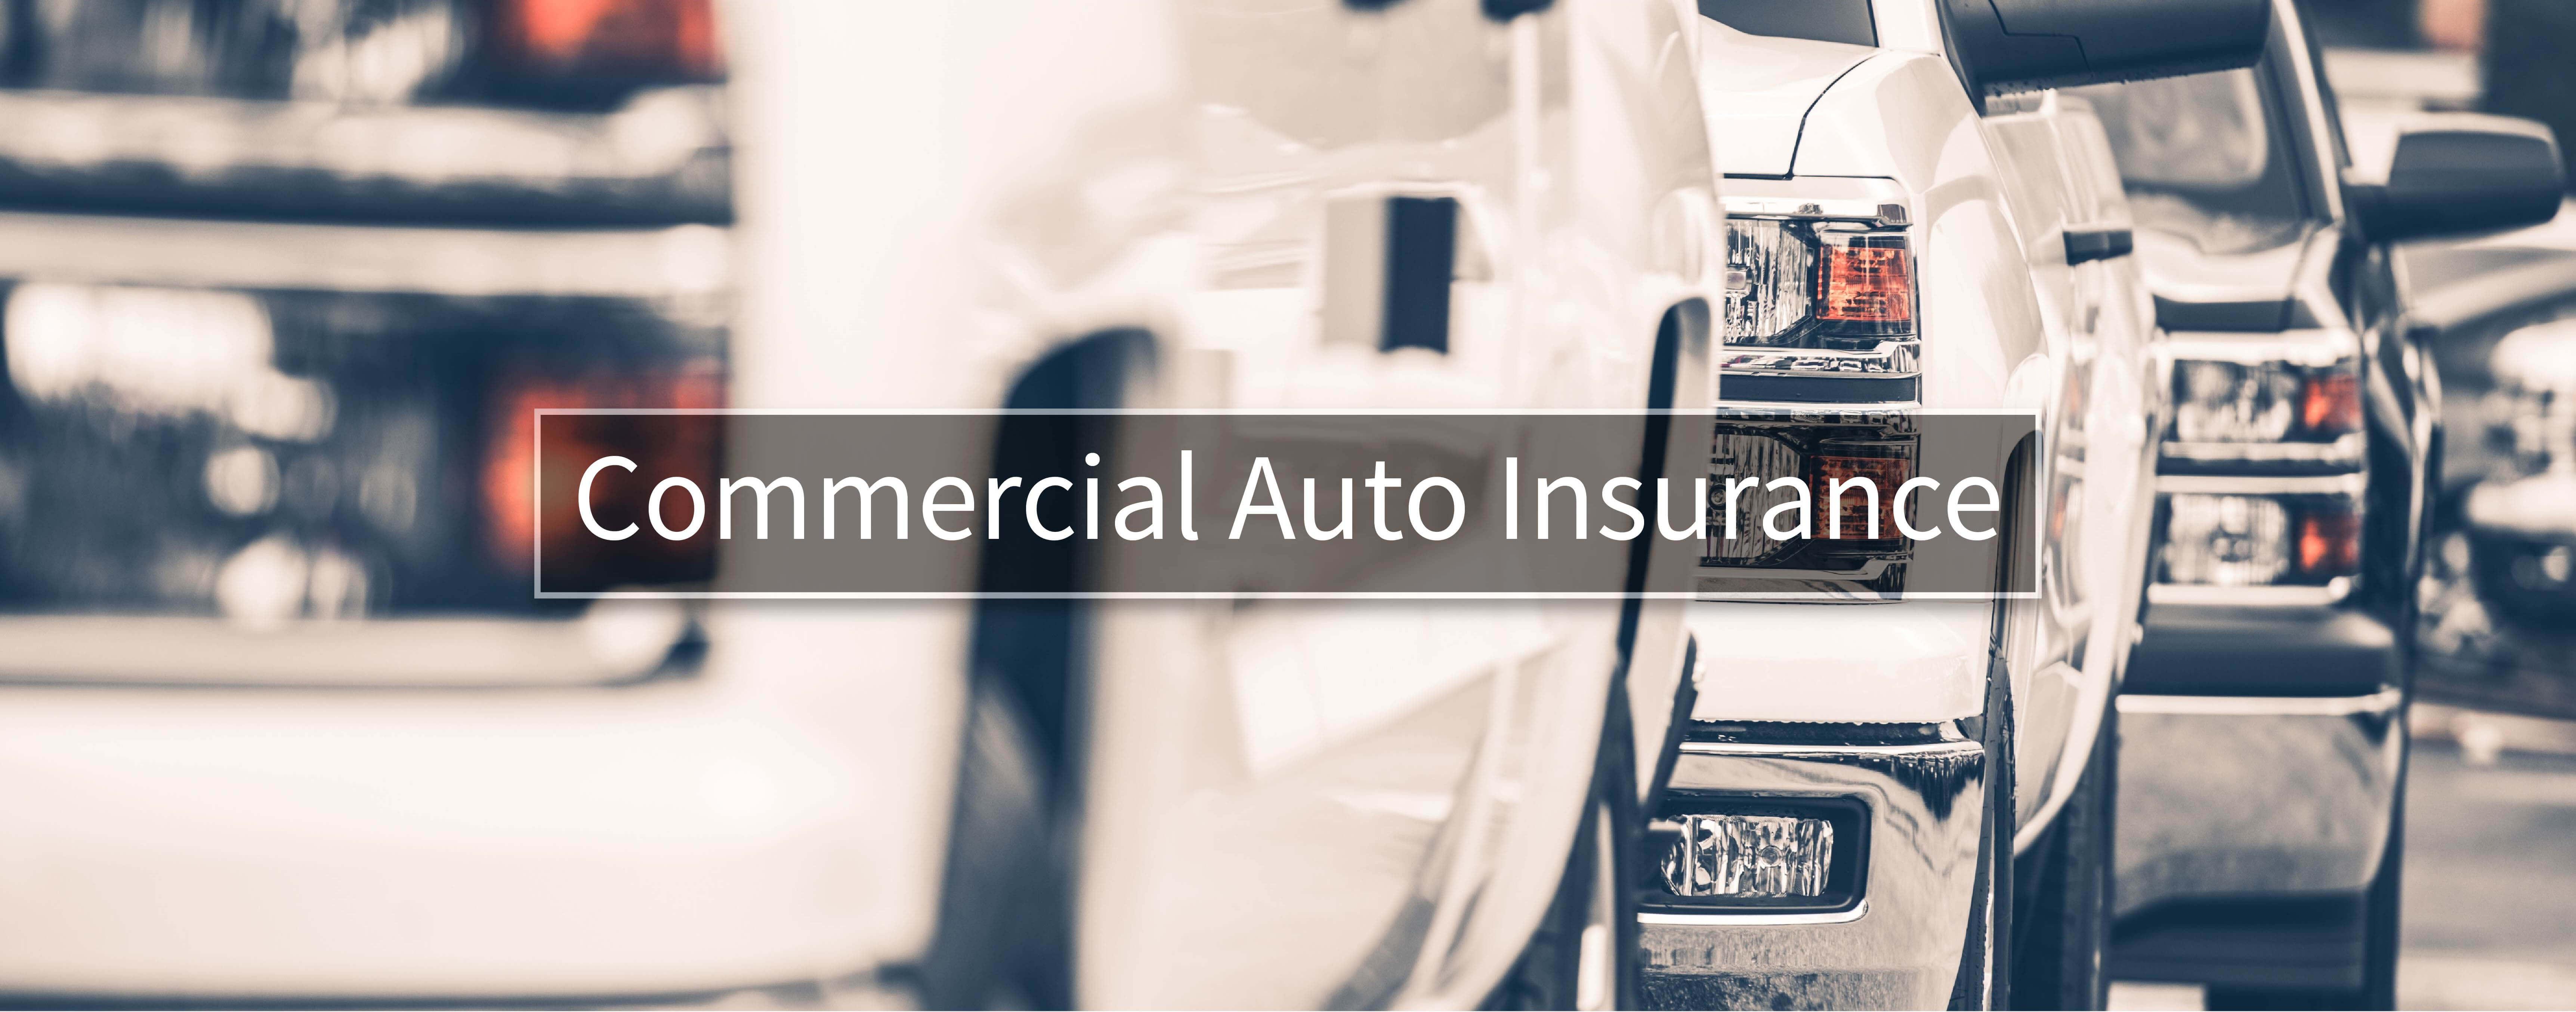 Commercial Auto Insurance Framingham